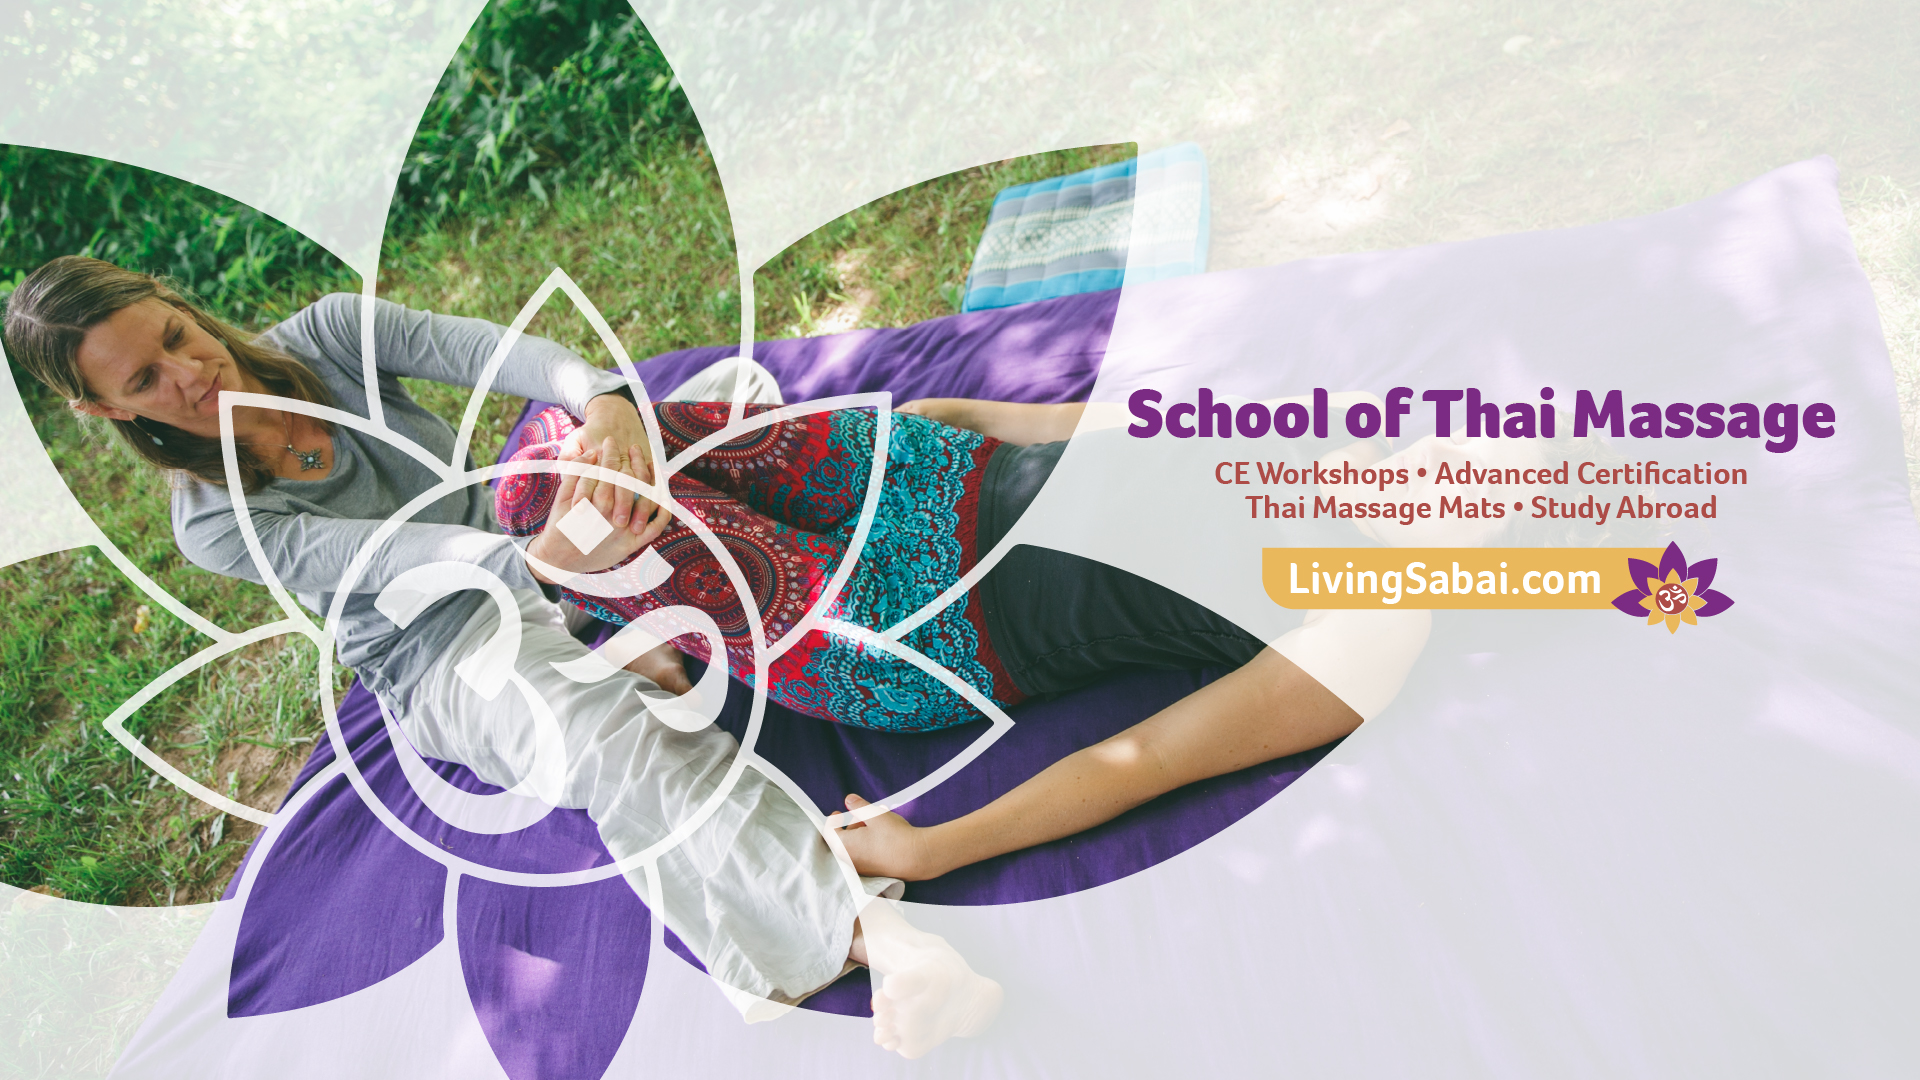 Living Sabai School of Thai Massage